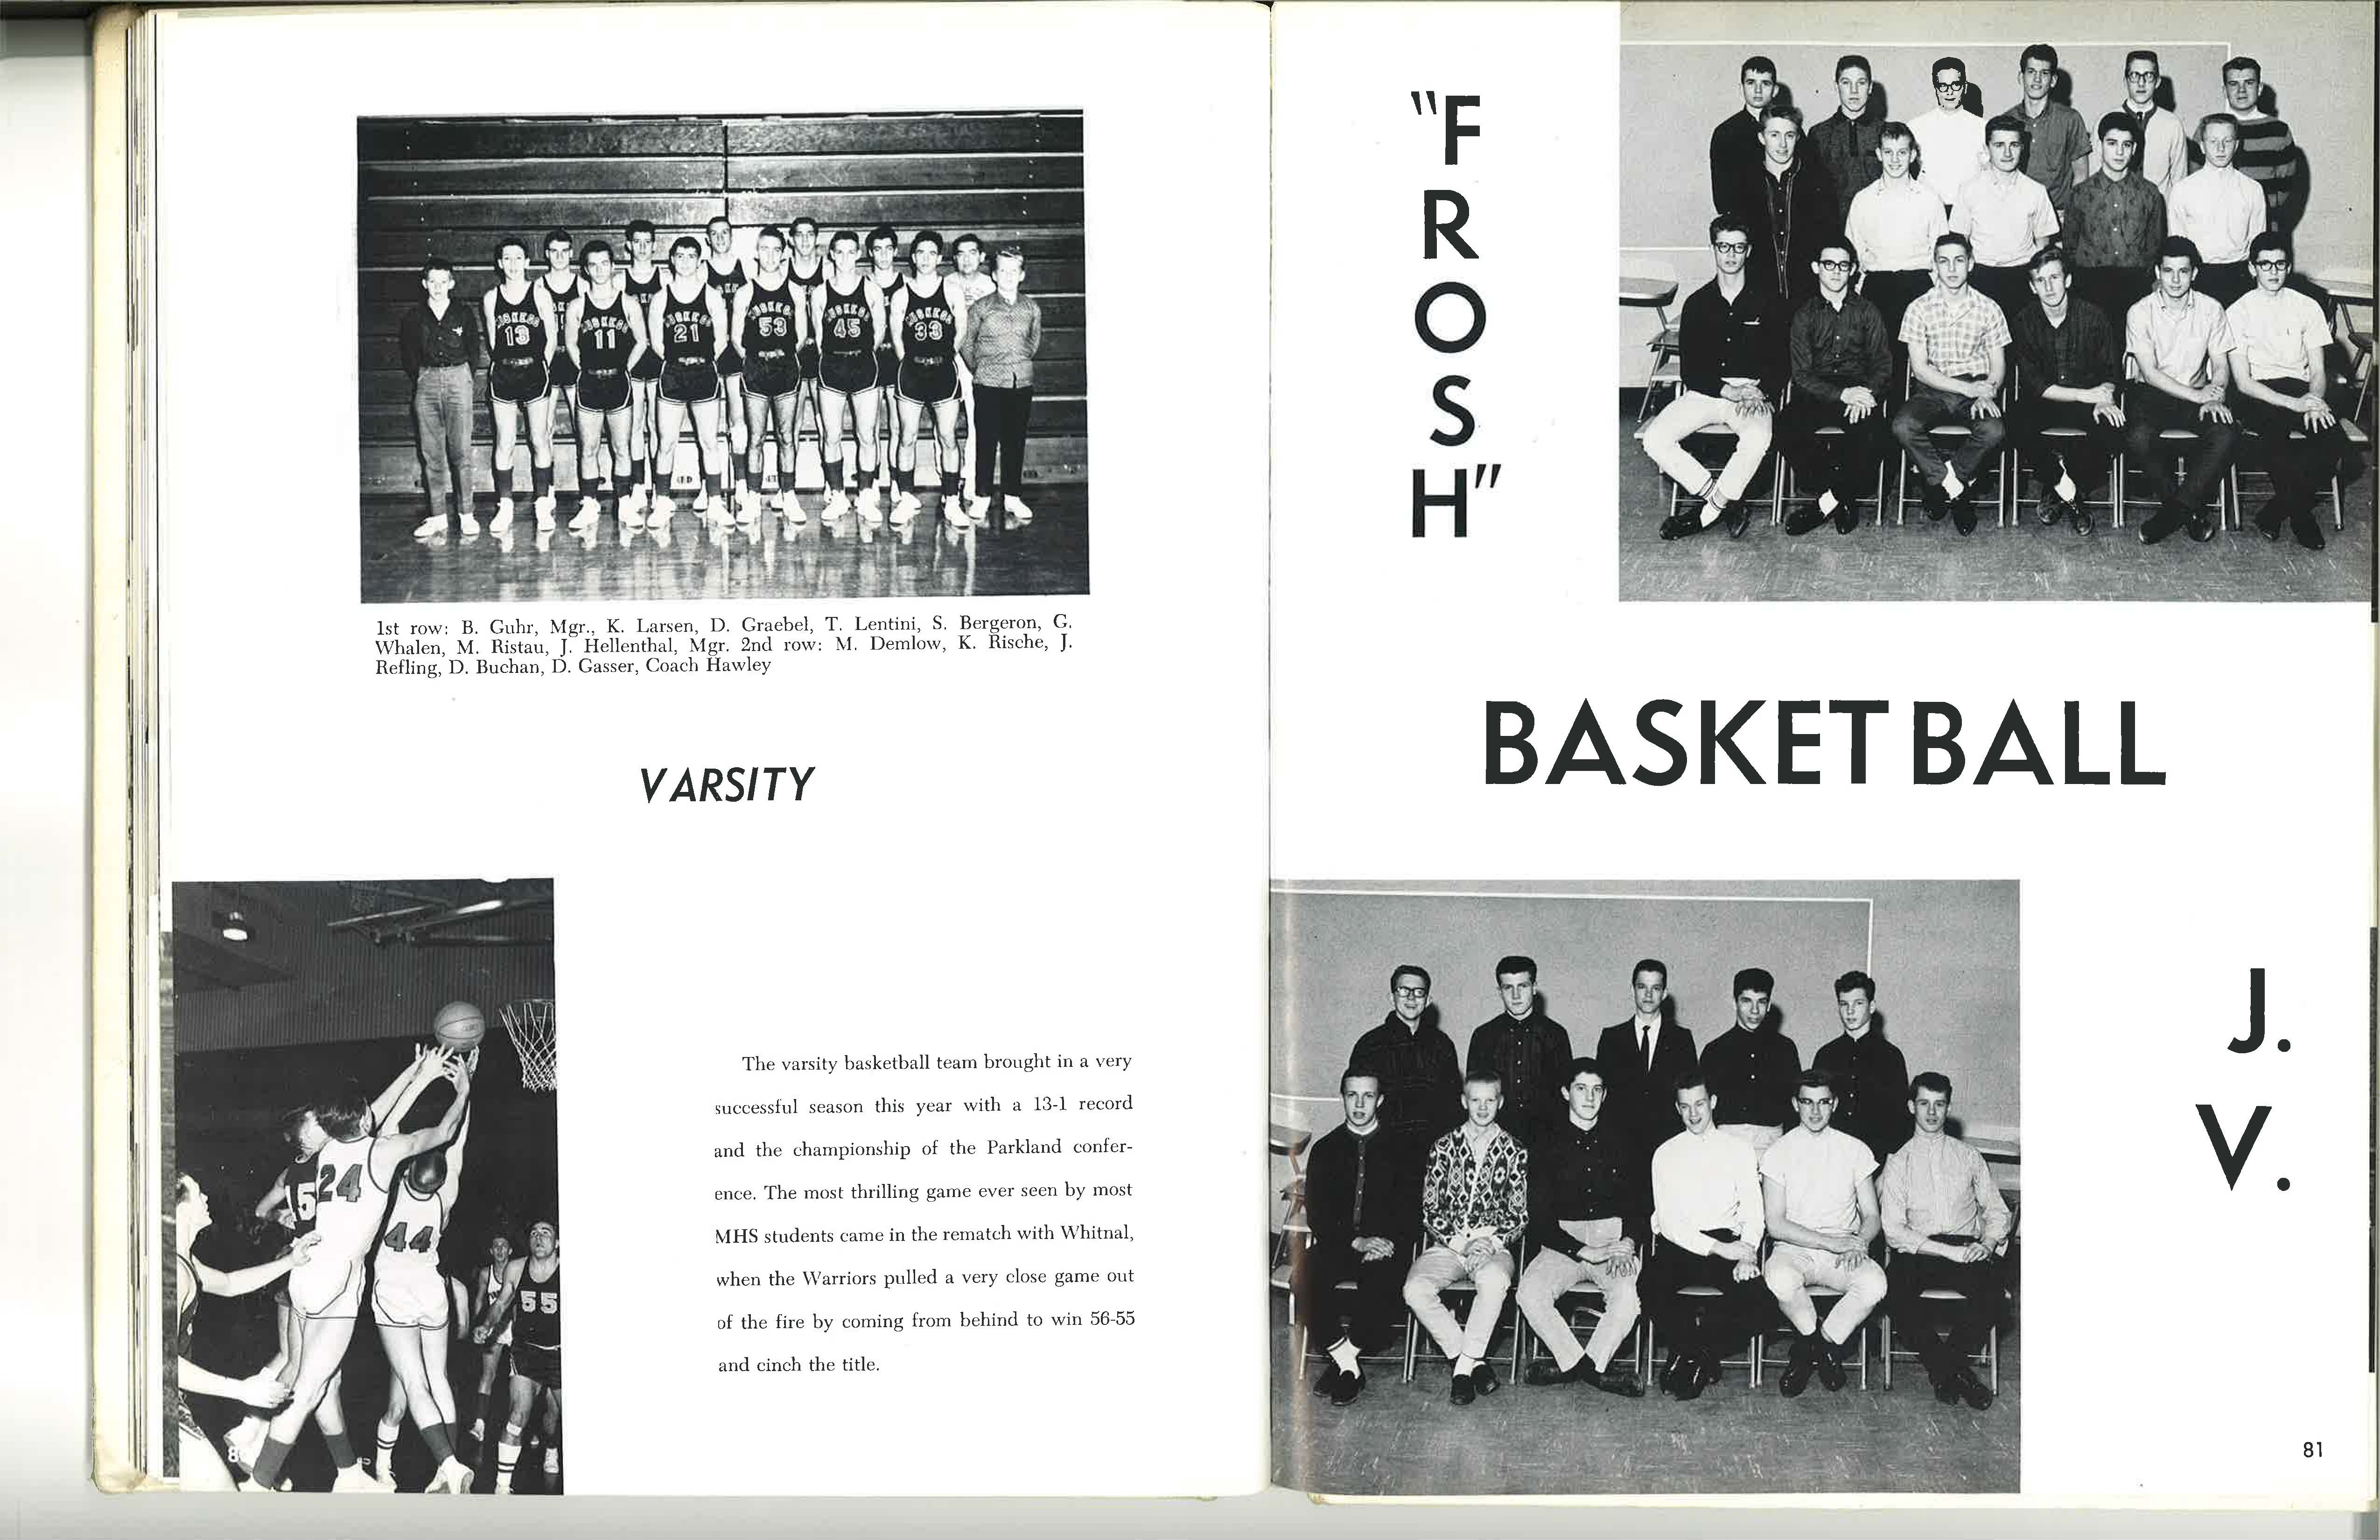 1964_Yearbook_Athletics_80-81.jpg